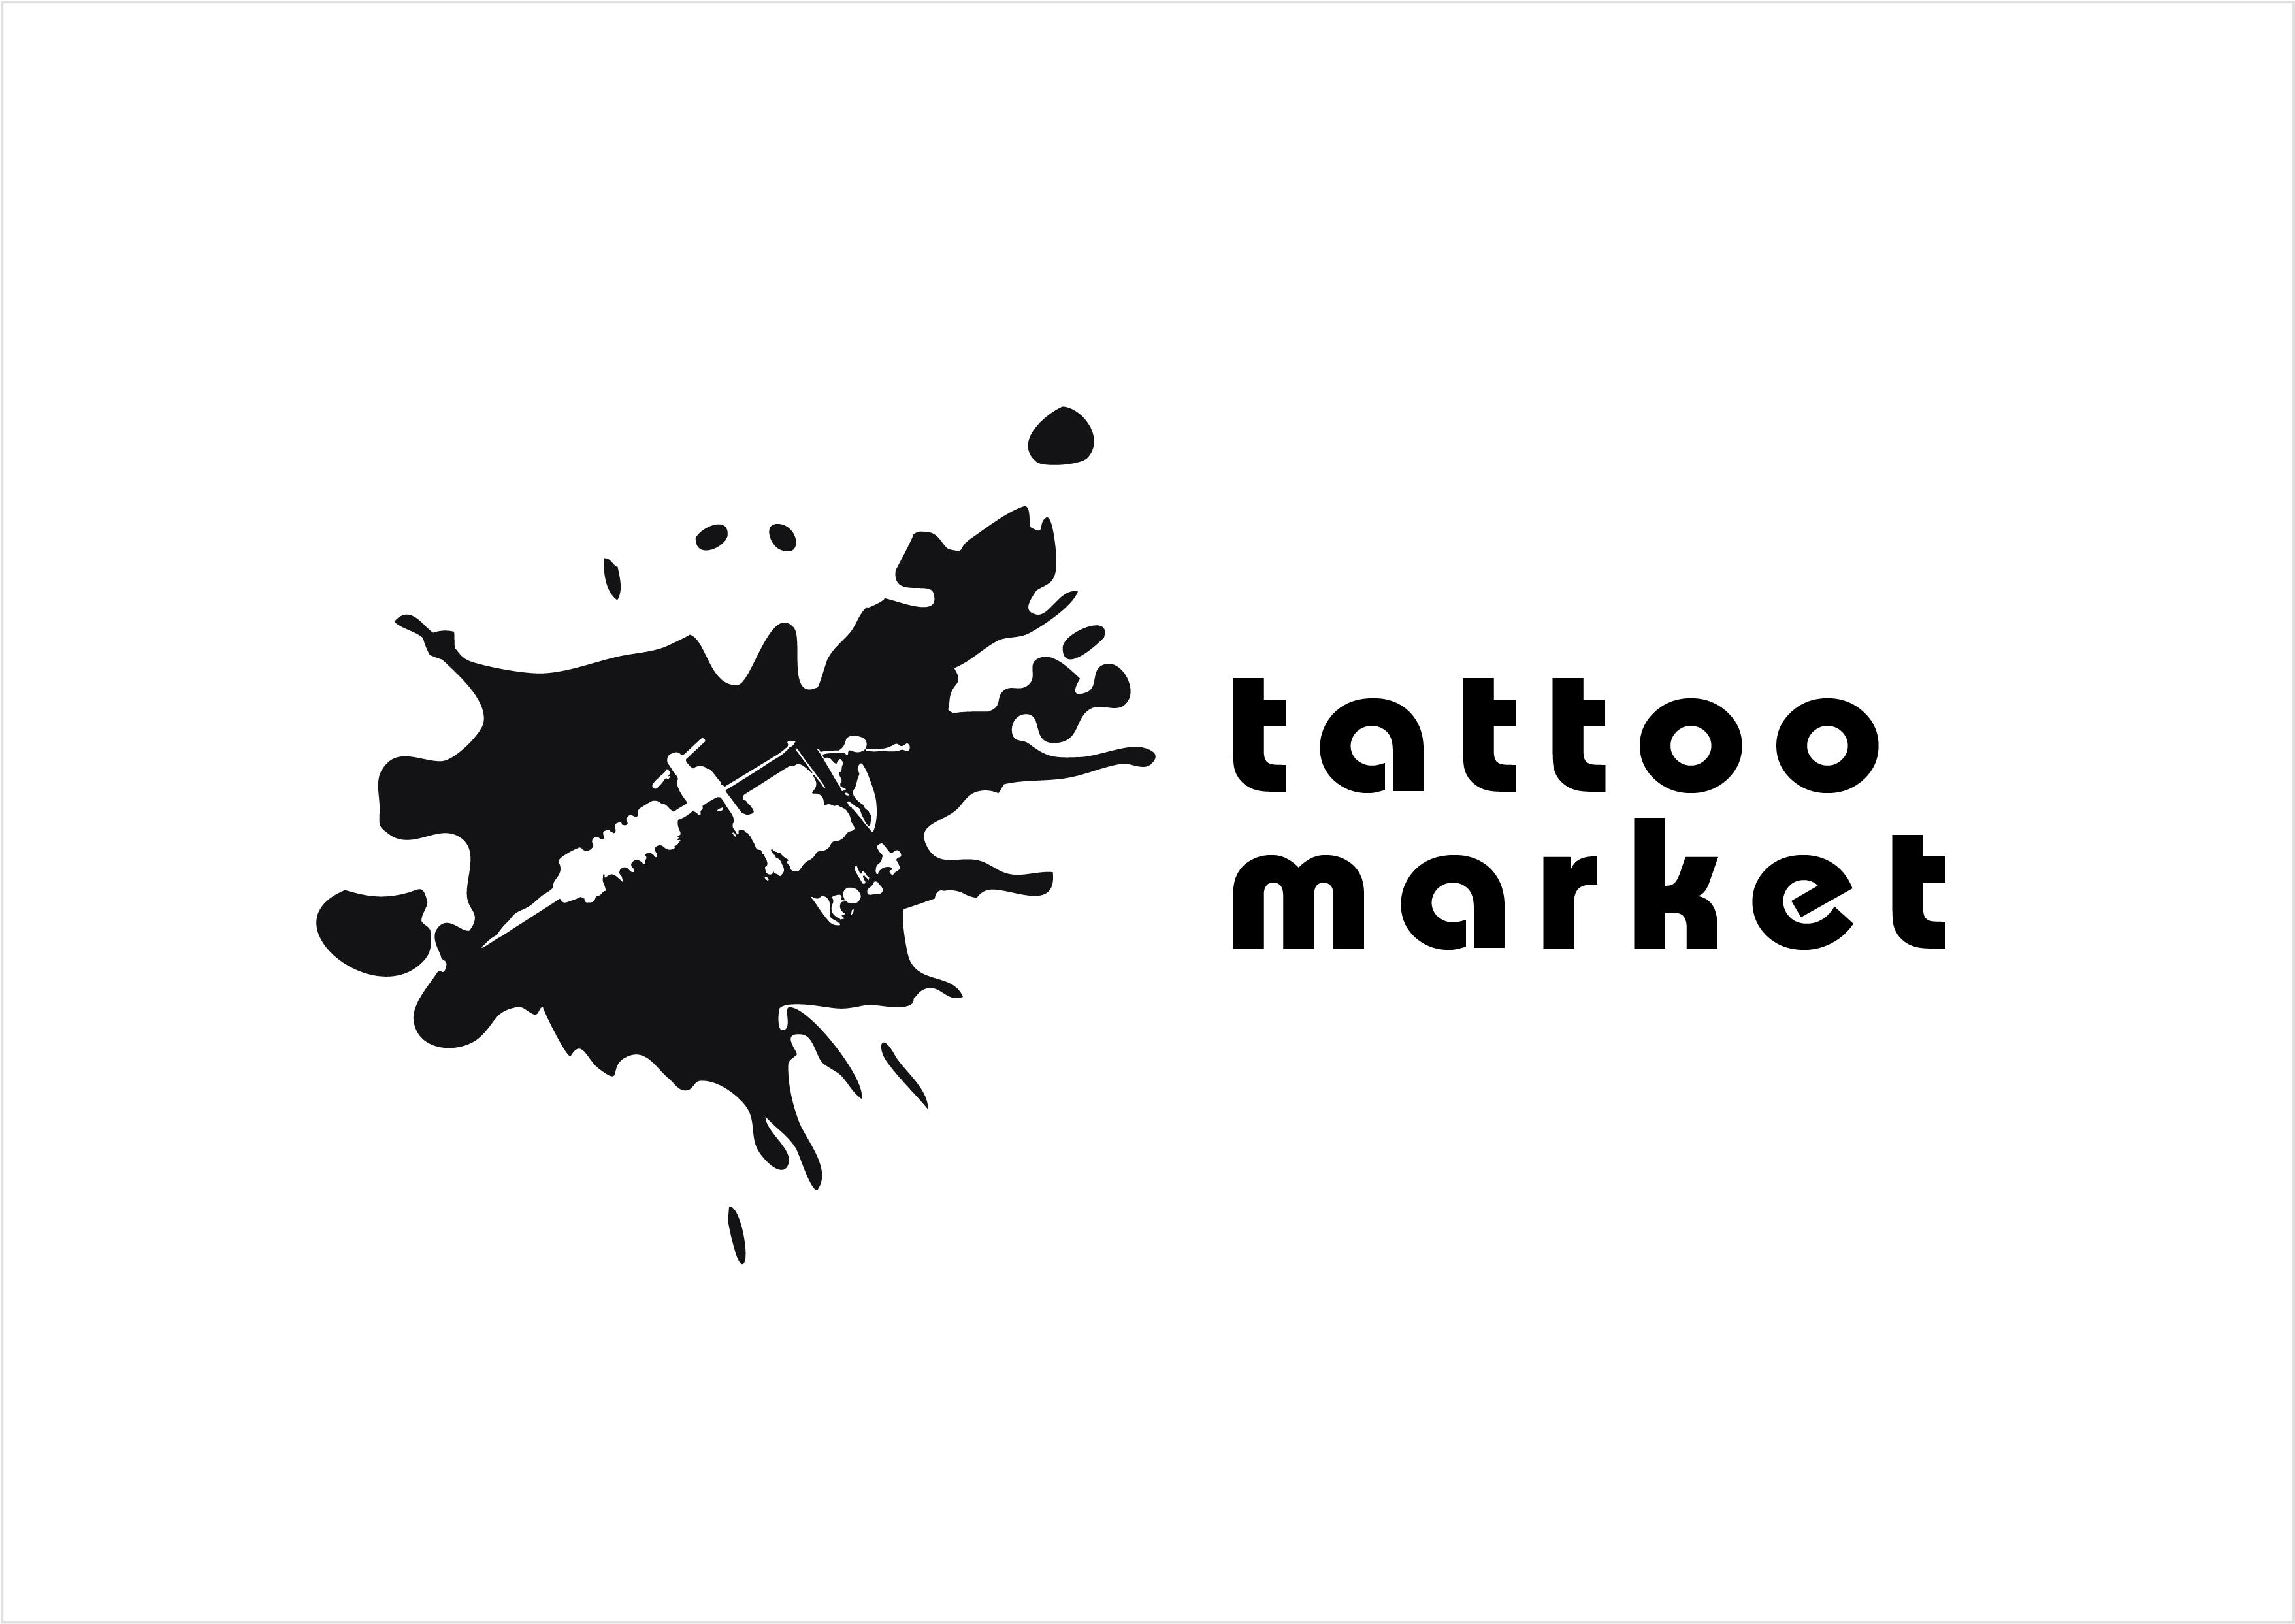 Редизайн логотипа магазина тату оборудования TattooMarket.ru фото f_3795c535583af1a2.jpg